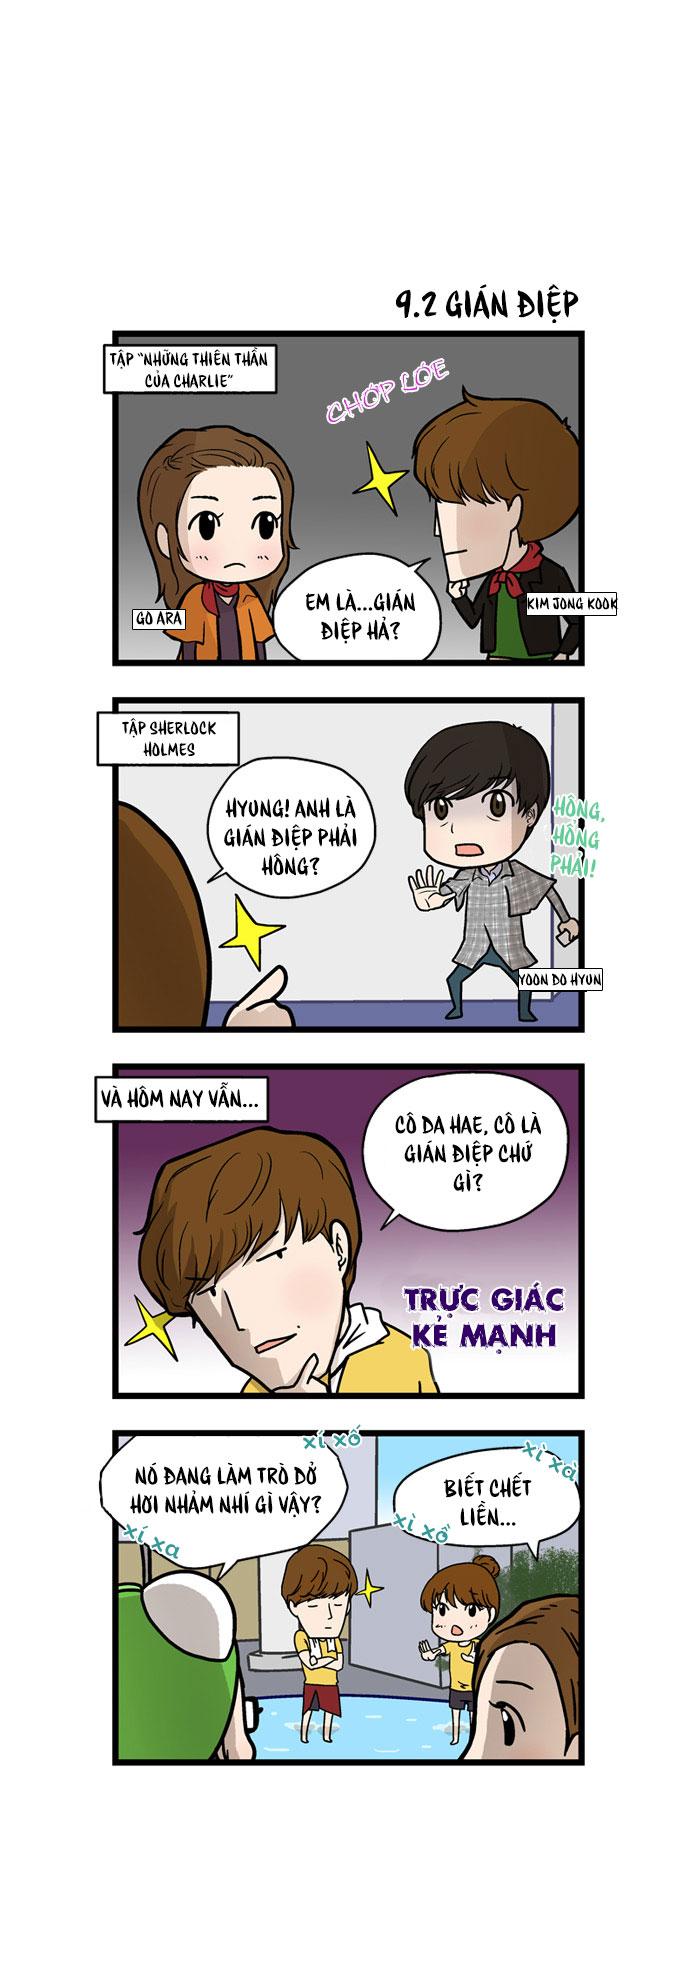 Running Man chap 9 - Trang 2